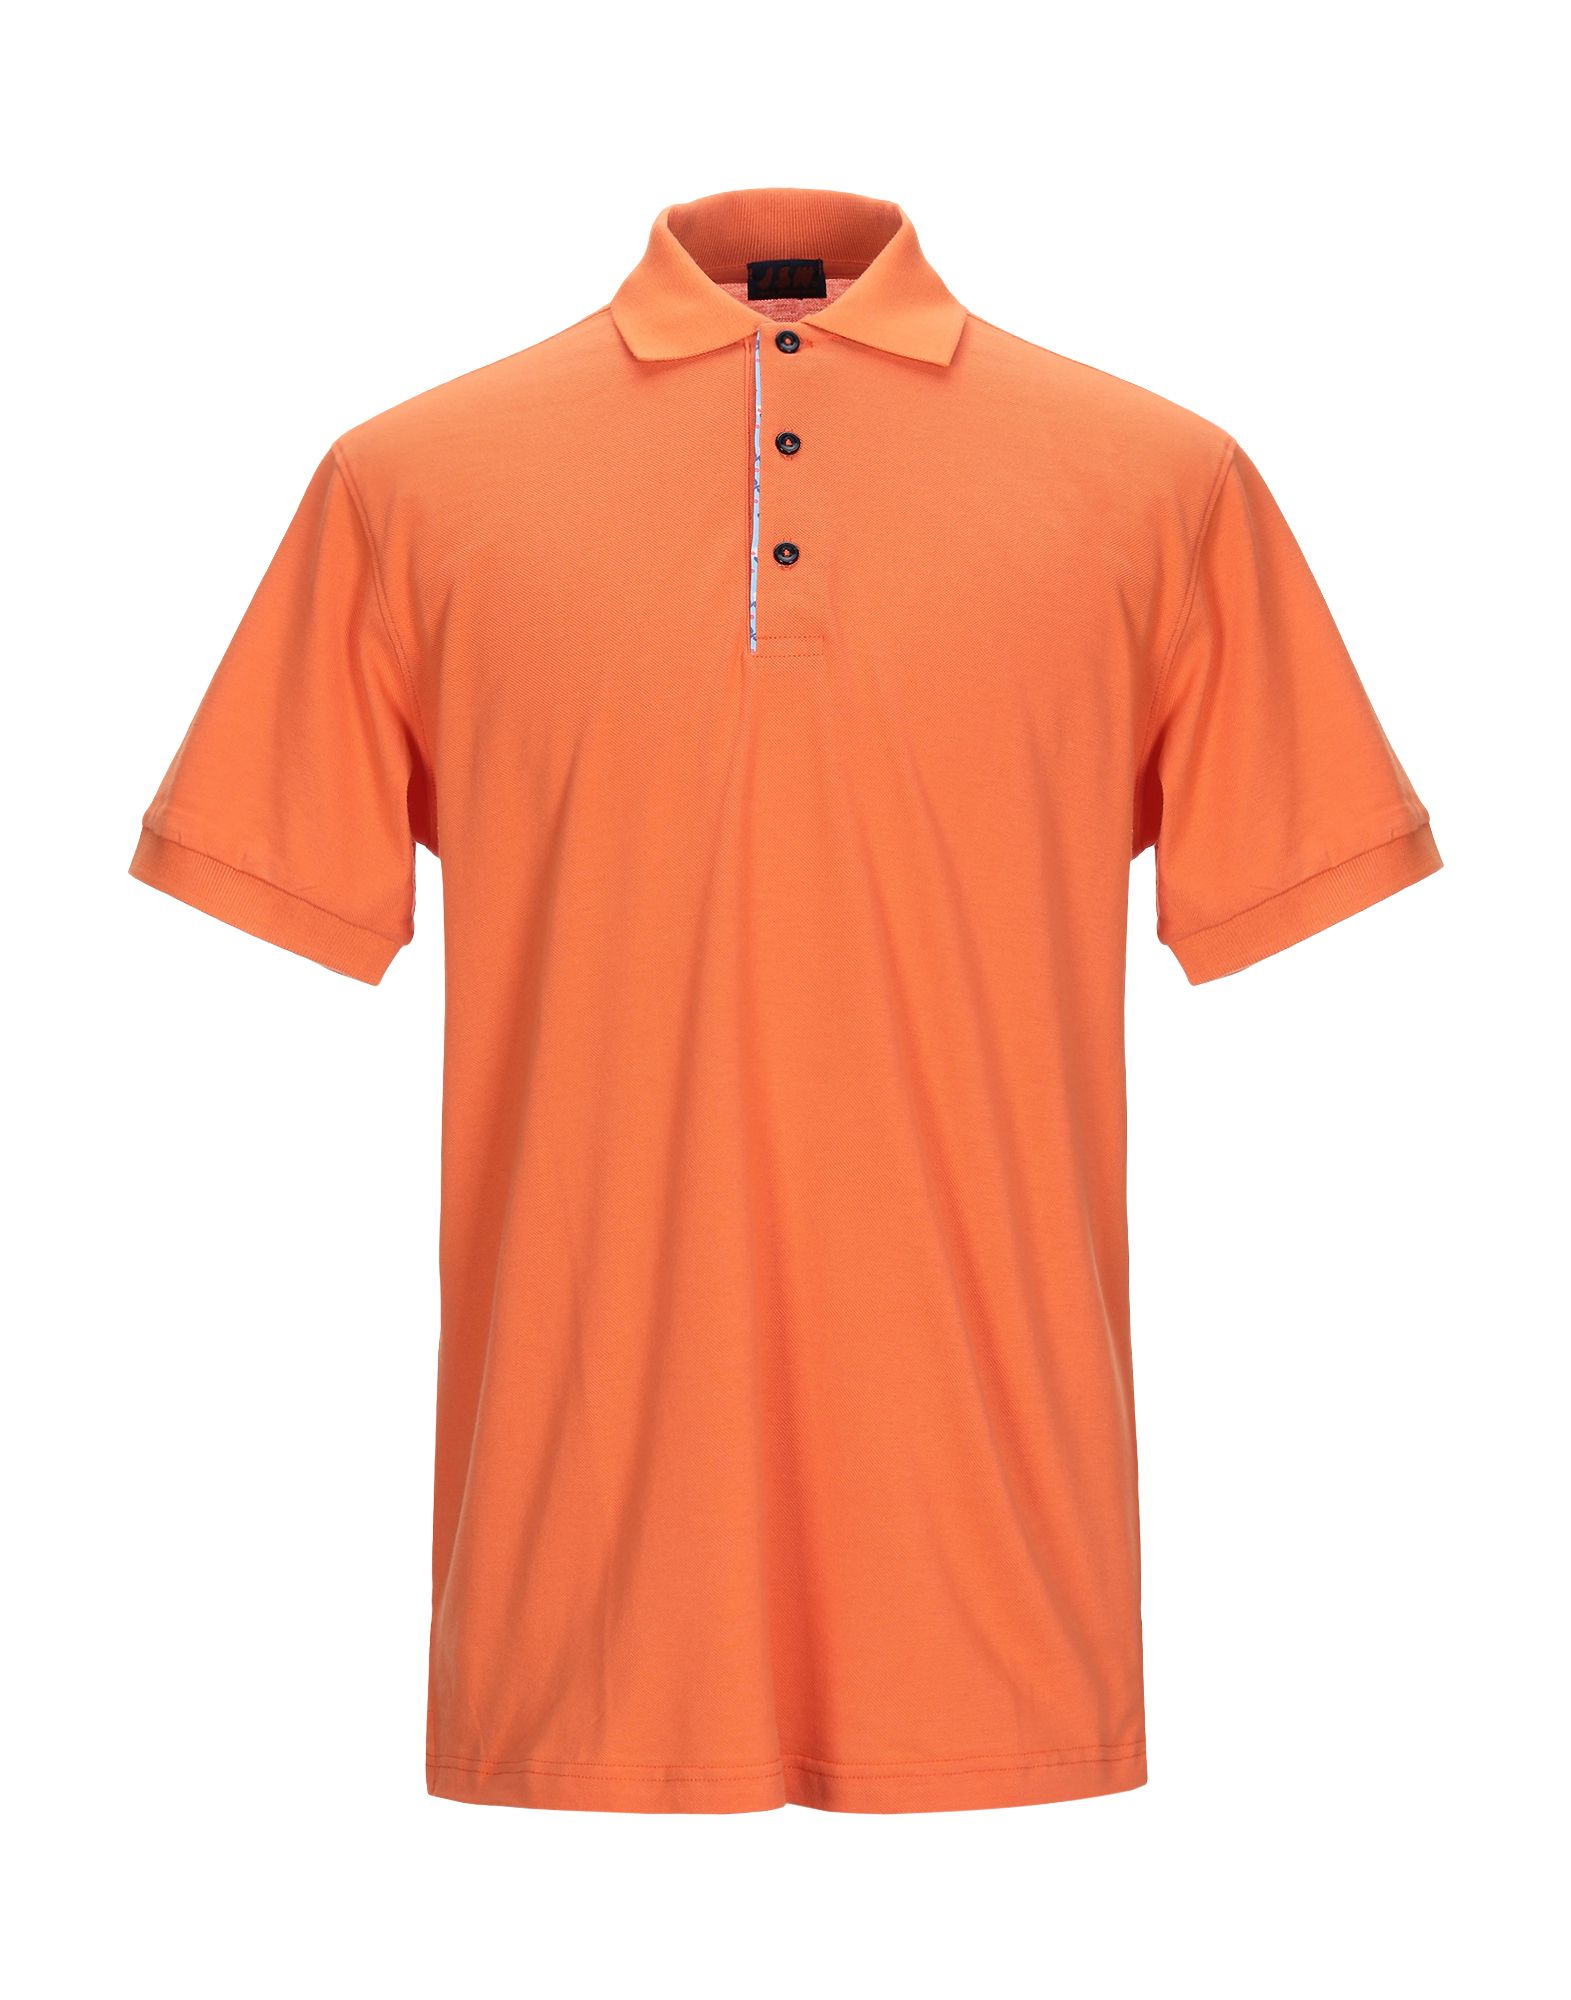 JSW® JEANS STORES WIDE Polo shirts. piqué, no appliqués, basic solid color, polo collar, short sleeves, front closure, button closing, no pockets. 100% Cotton